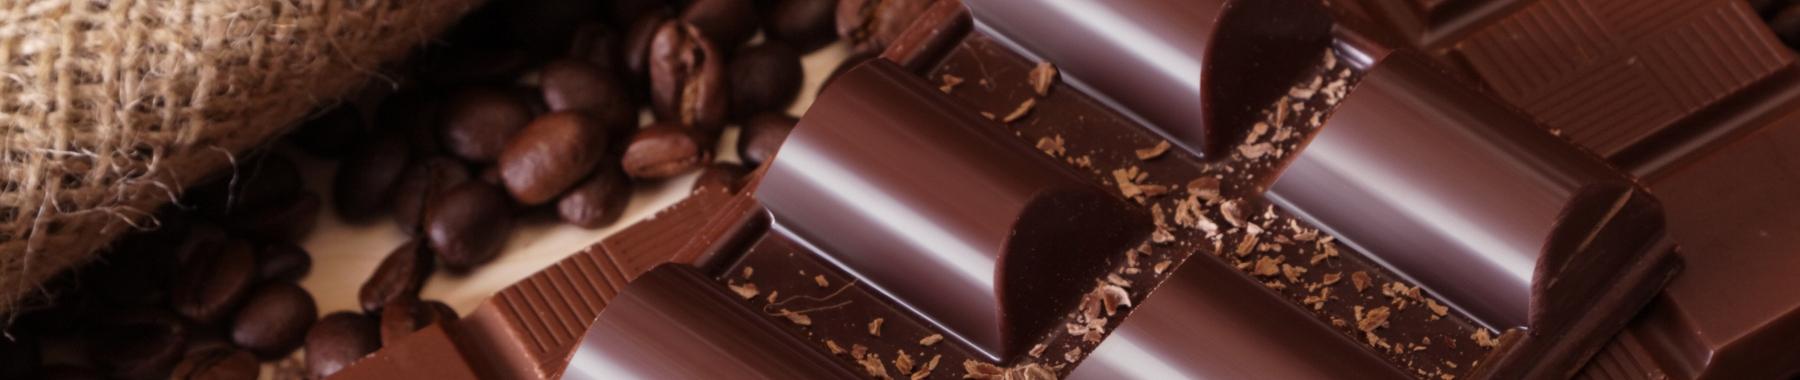 hdr-flav-chocolate-1800.jpg